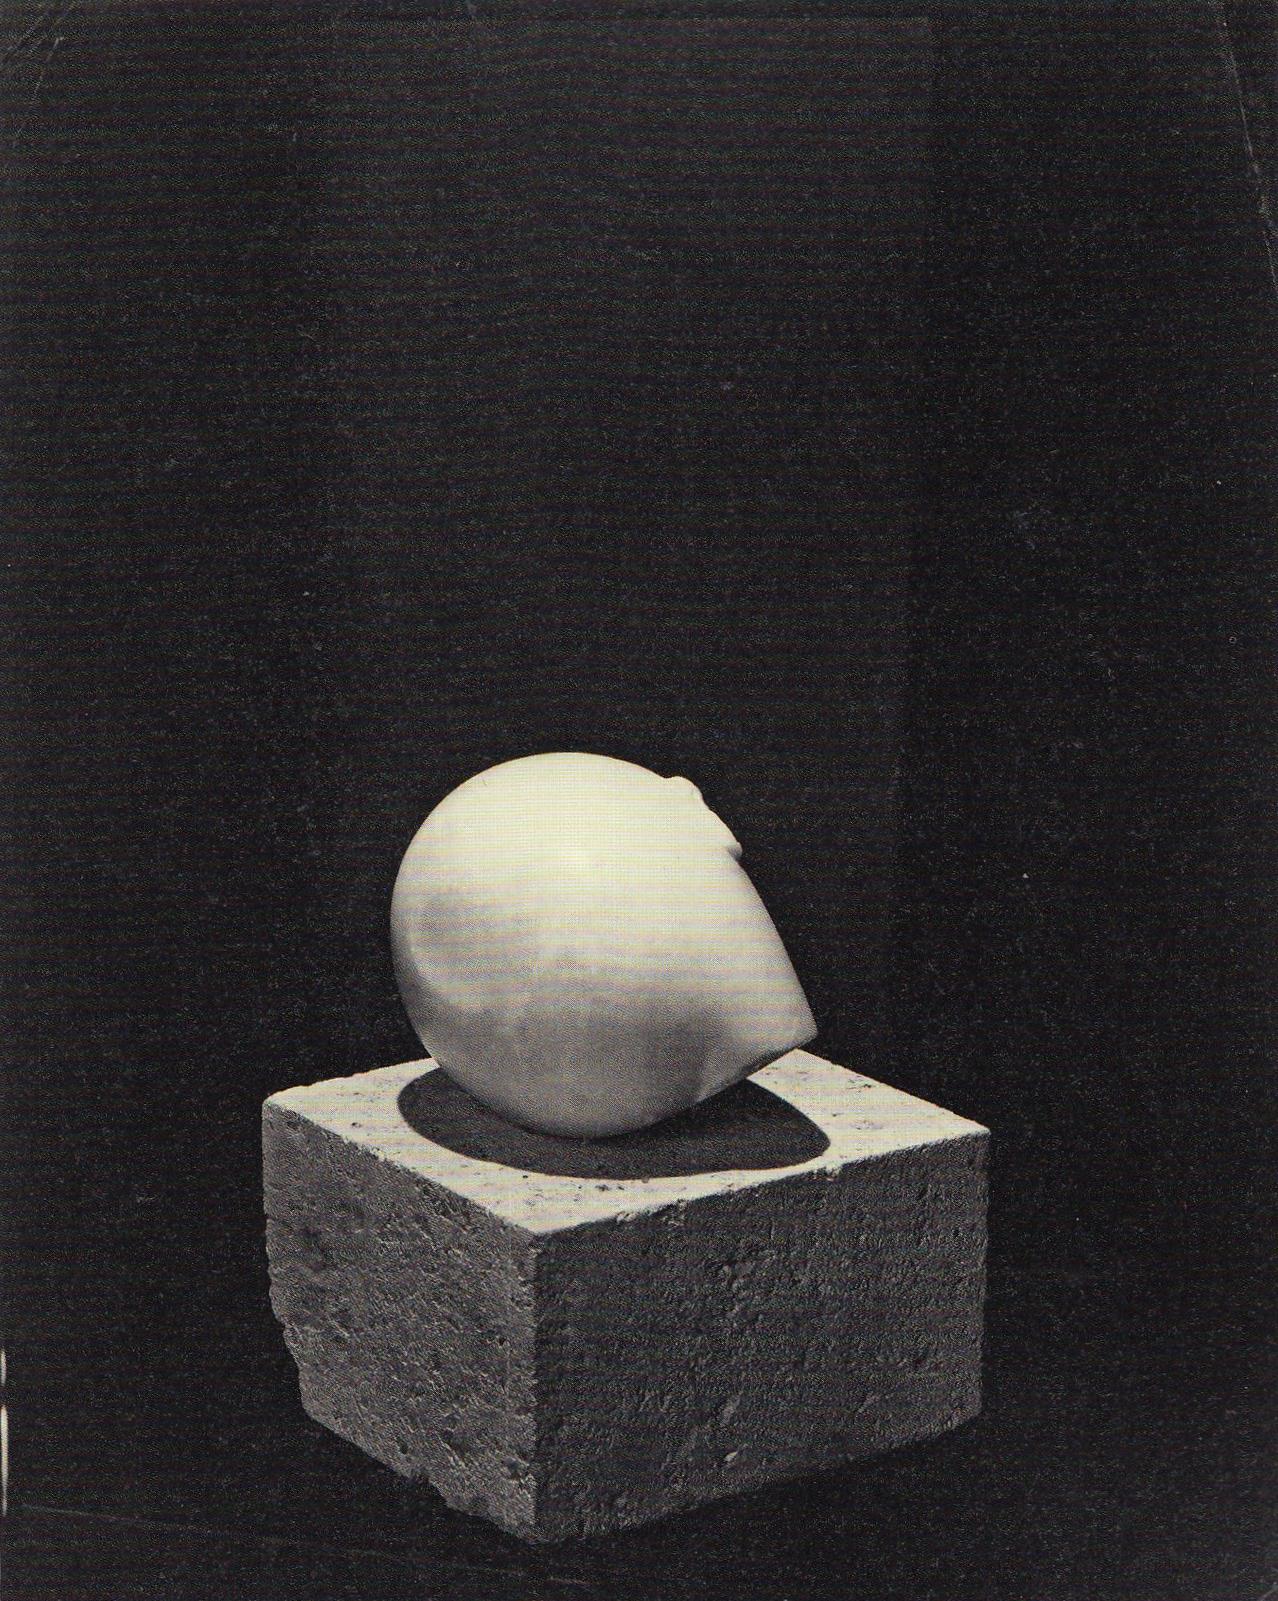 'Brancusi, Film, Photographie: Images Sans Fin' - BOOK